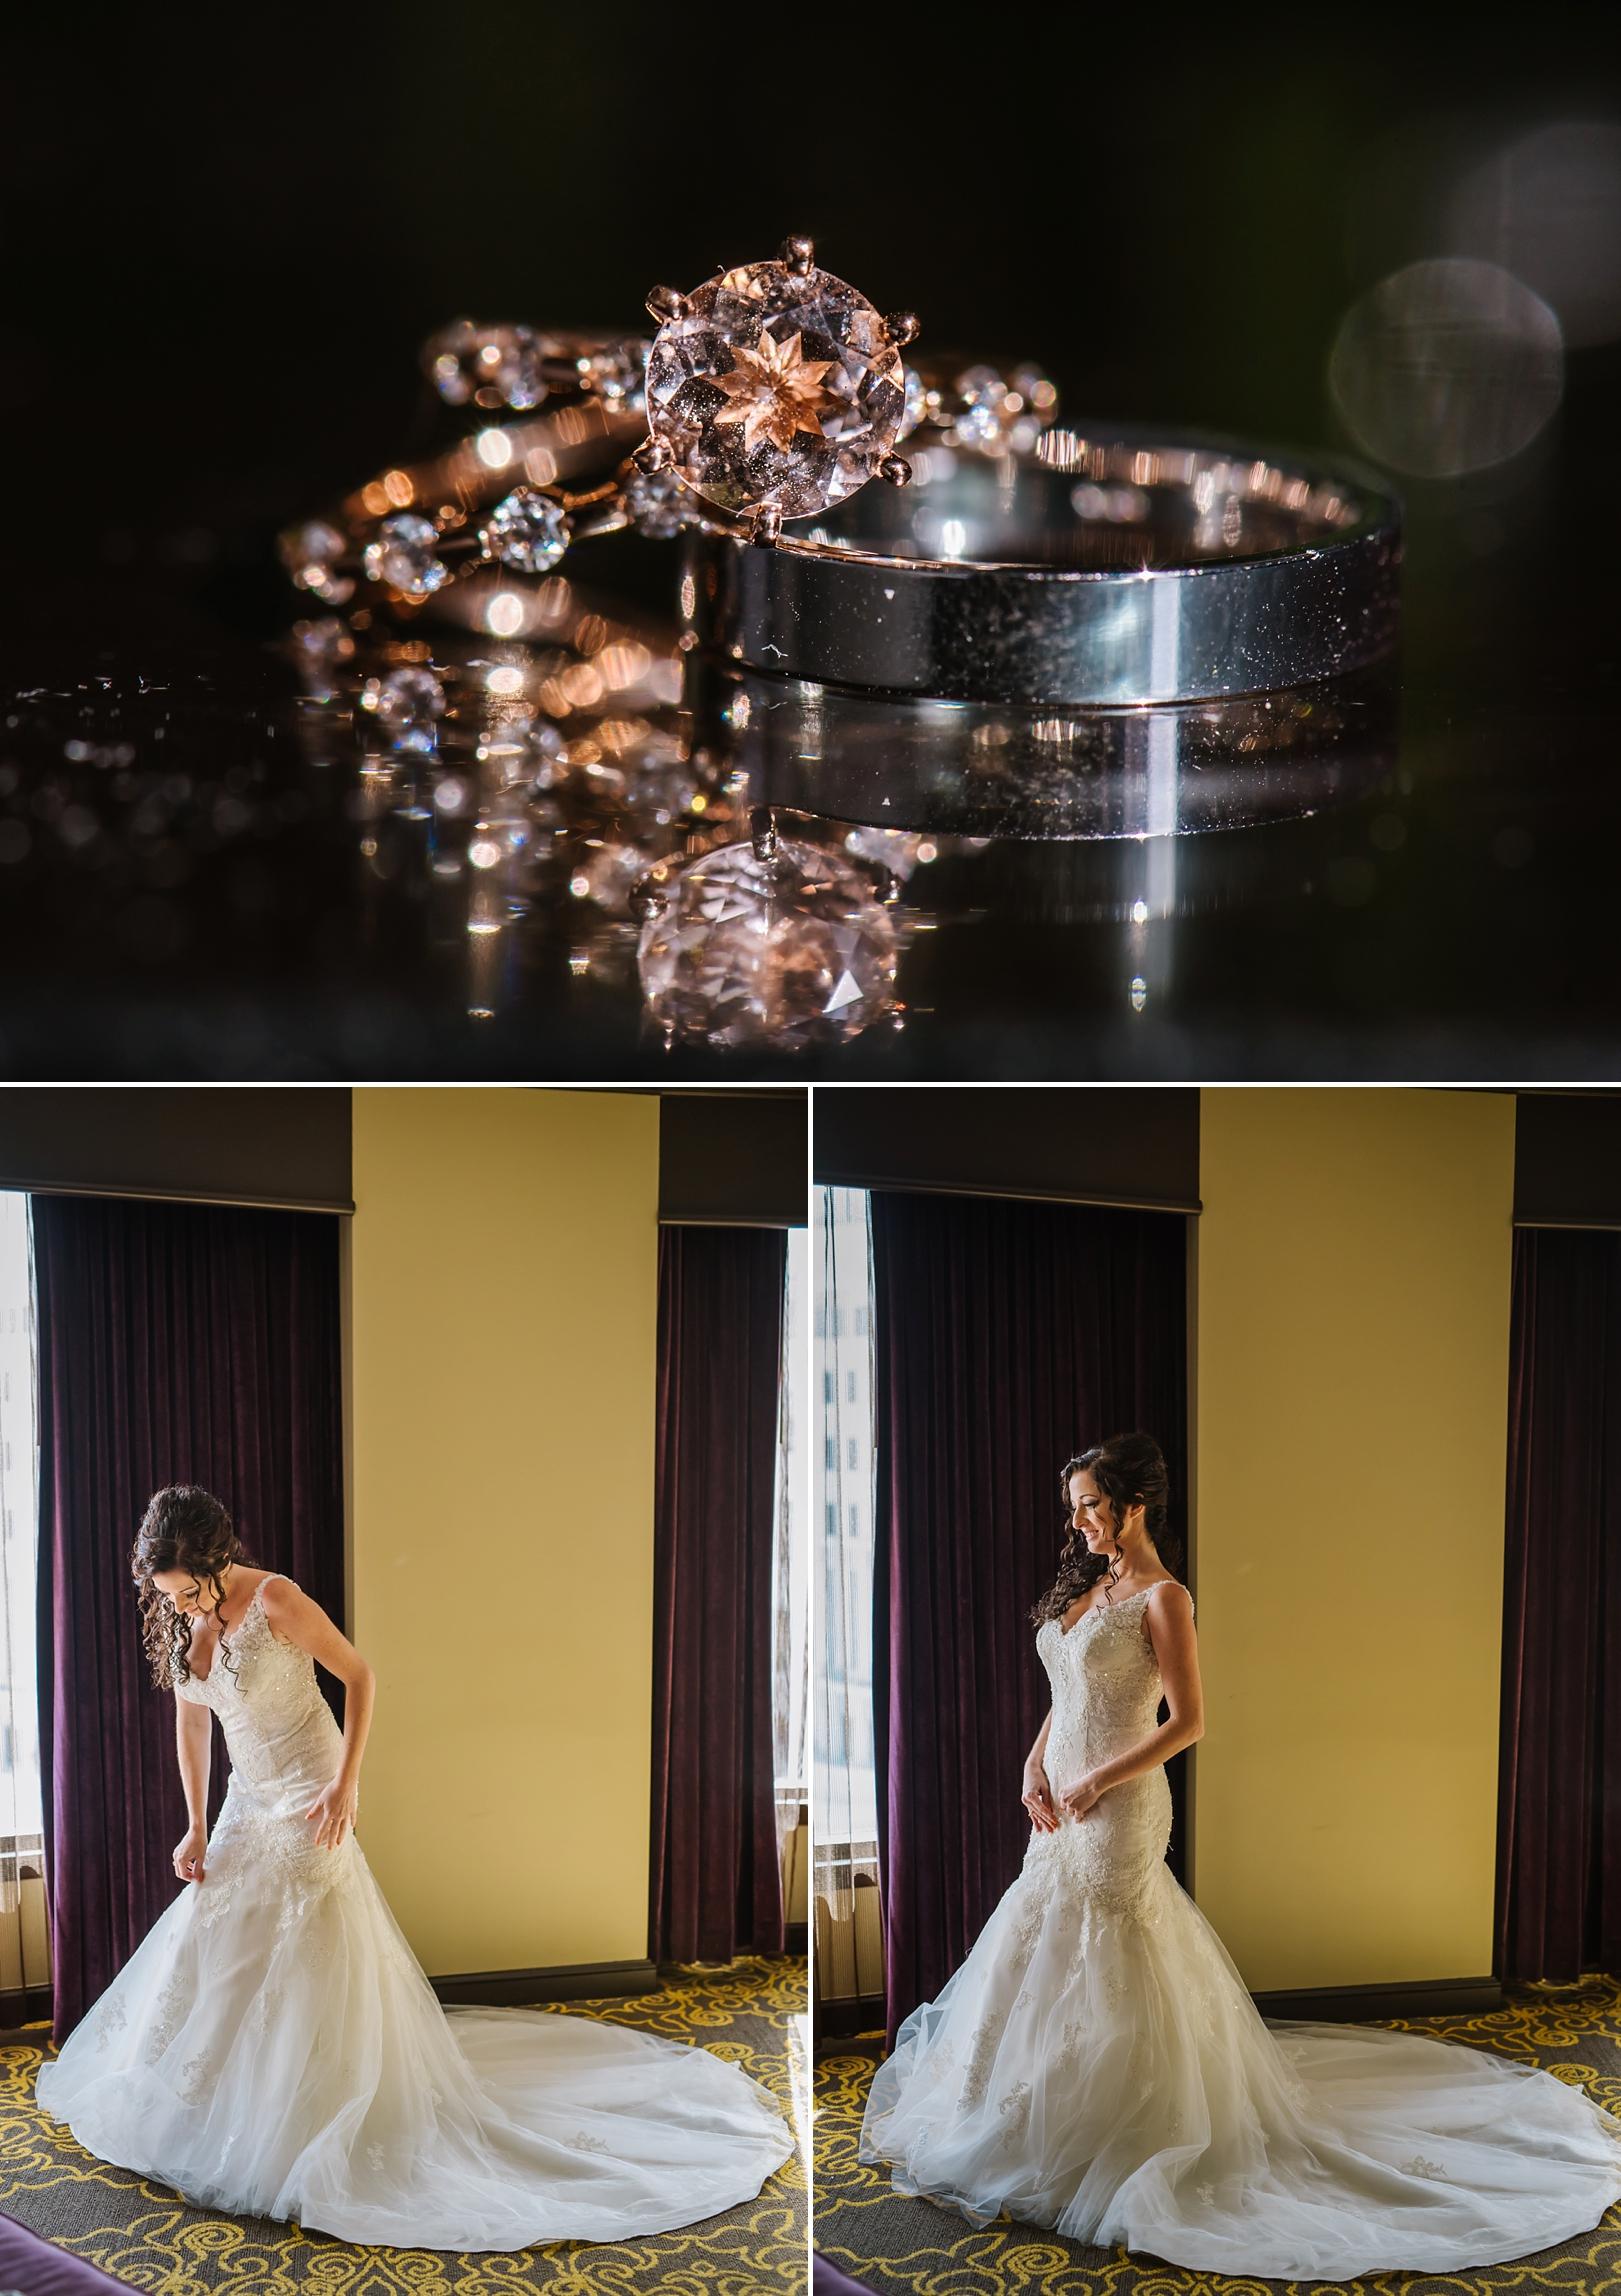 kraft-azalea-gardens-stylish-elopment-wedding-photography_0004.jpg